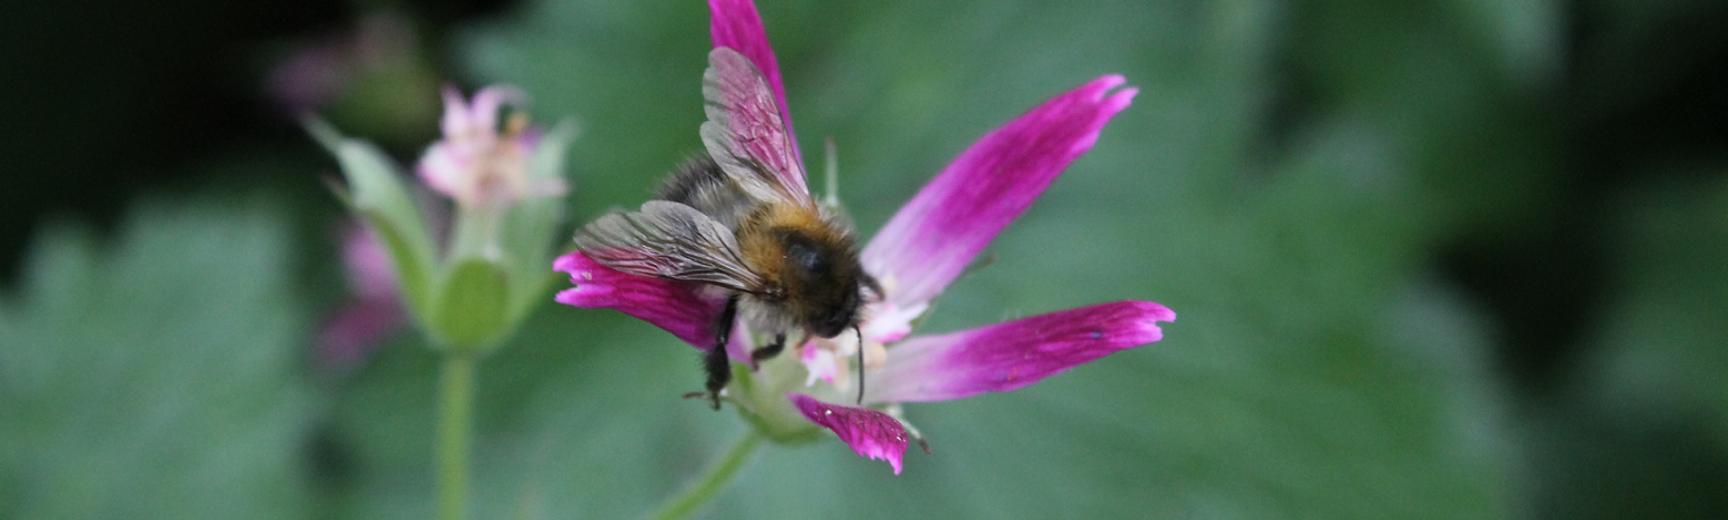 Bee on pink flower - photograph by Vikki Rose,Global Environmental Advisor (C Env MIEMA)